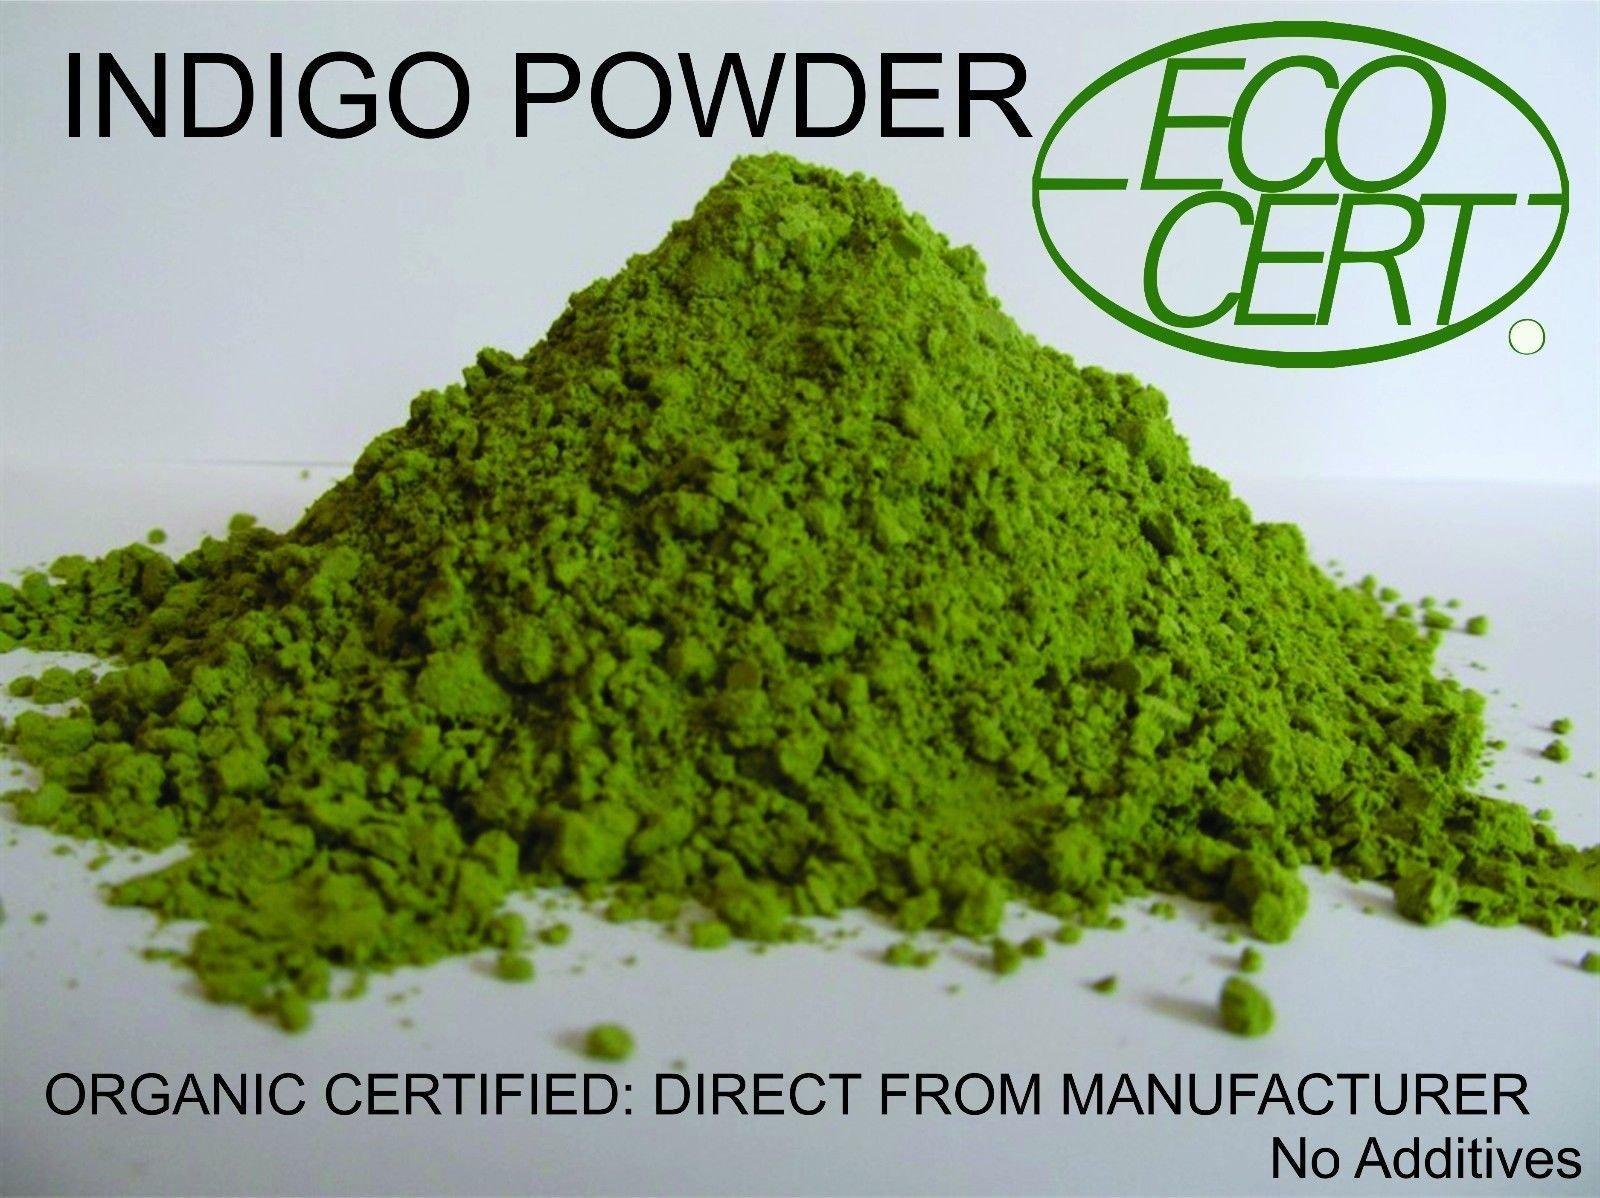 INDIGO POWDER ORGANIC CERTIFIED 500 gms Direct from Manufacturer 2018 Crop Premium